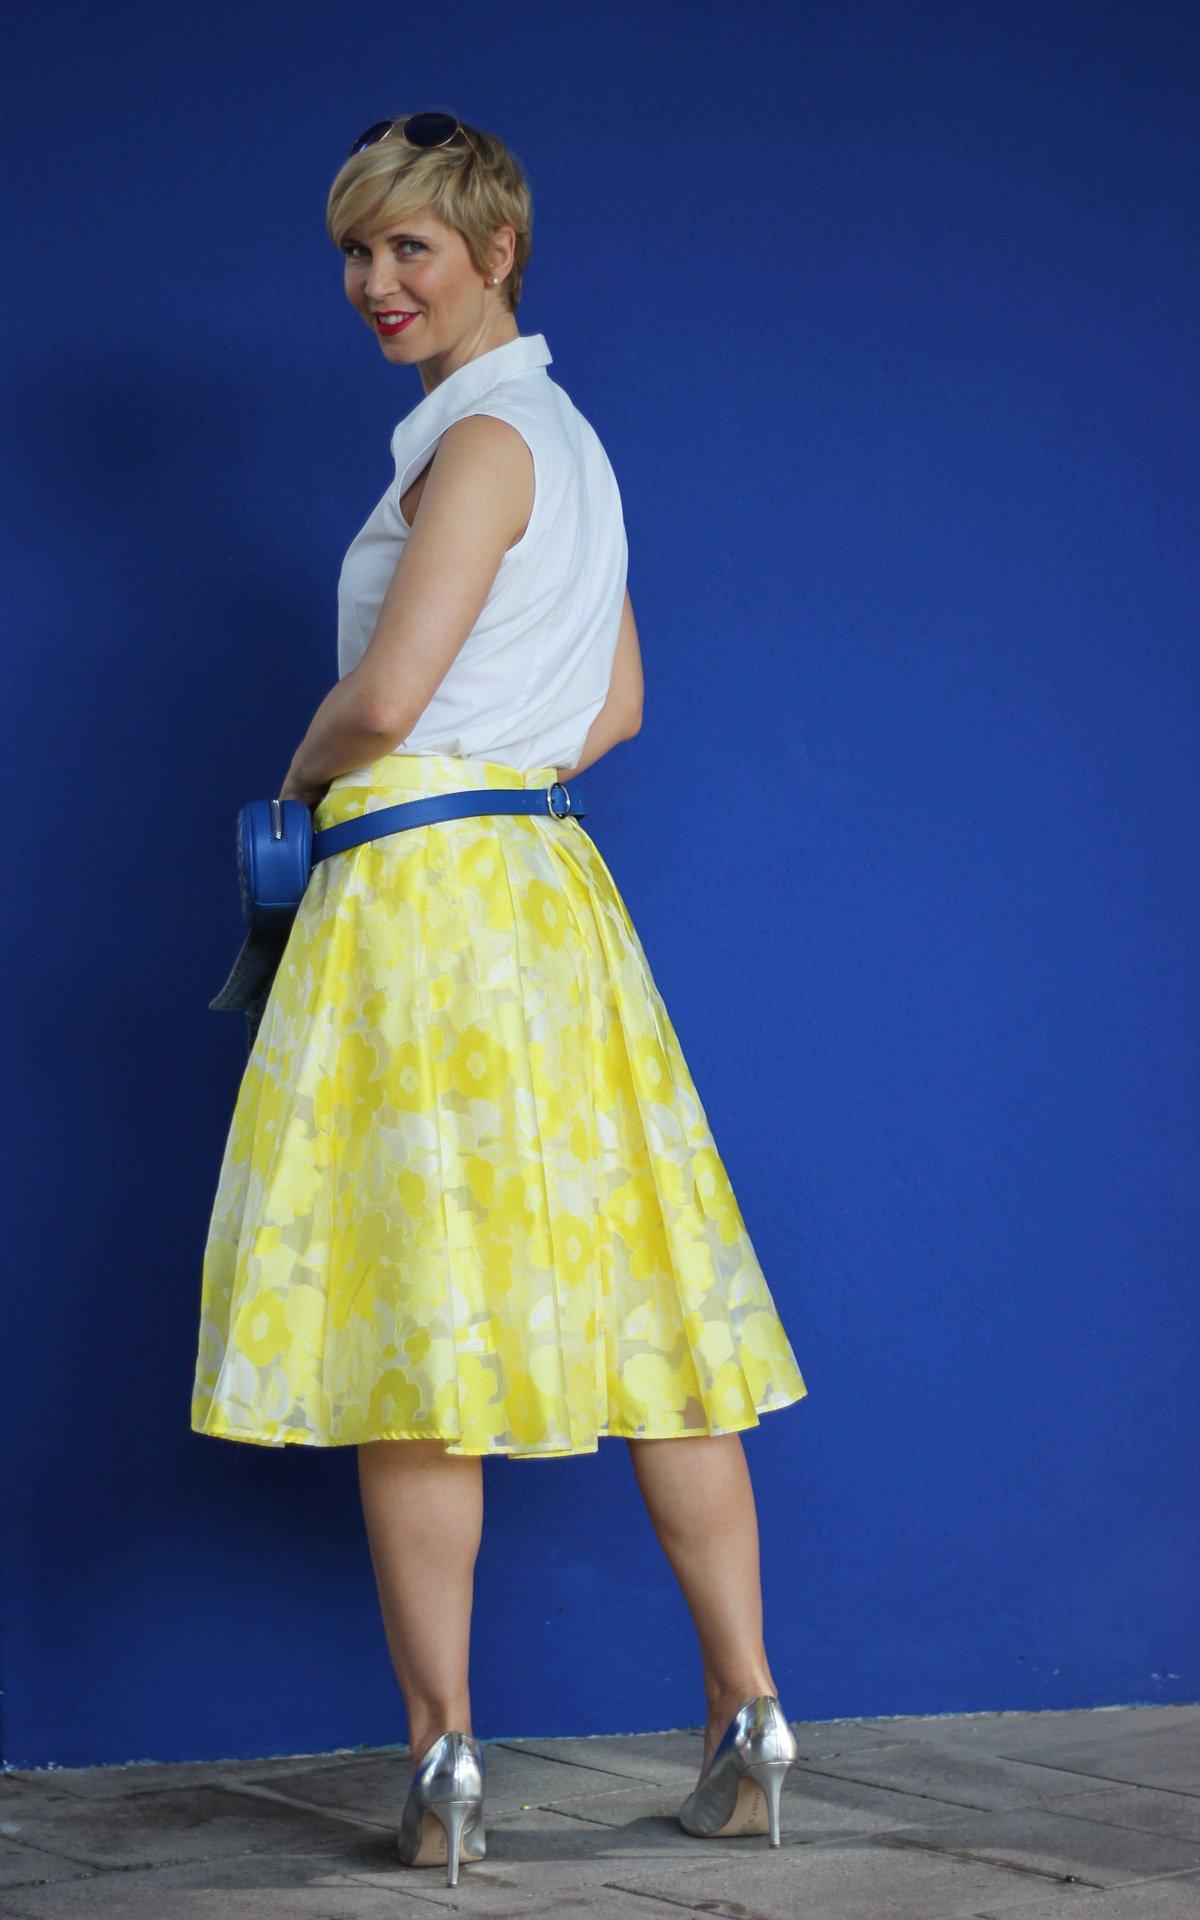 conny-doll-lifestyle: Sommerrock, Hosentaschen, ärmellose Bluse, Jeansjacke, Pumps